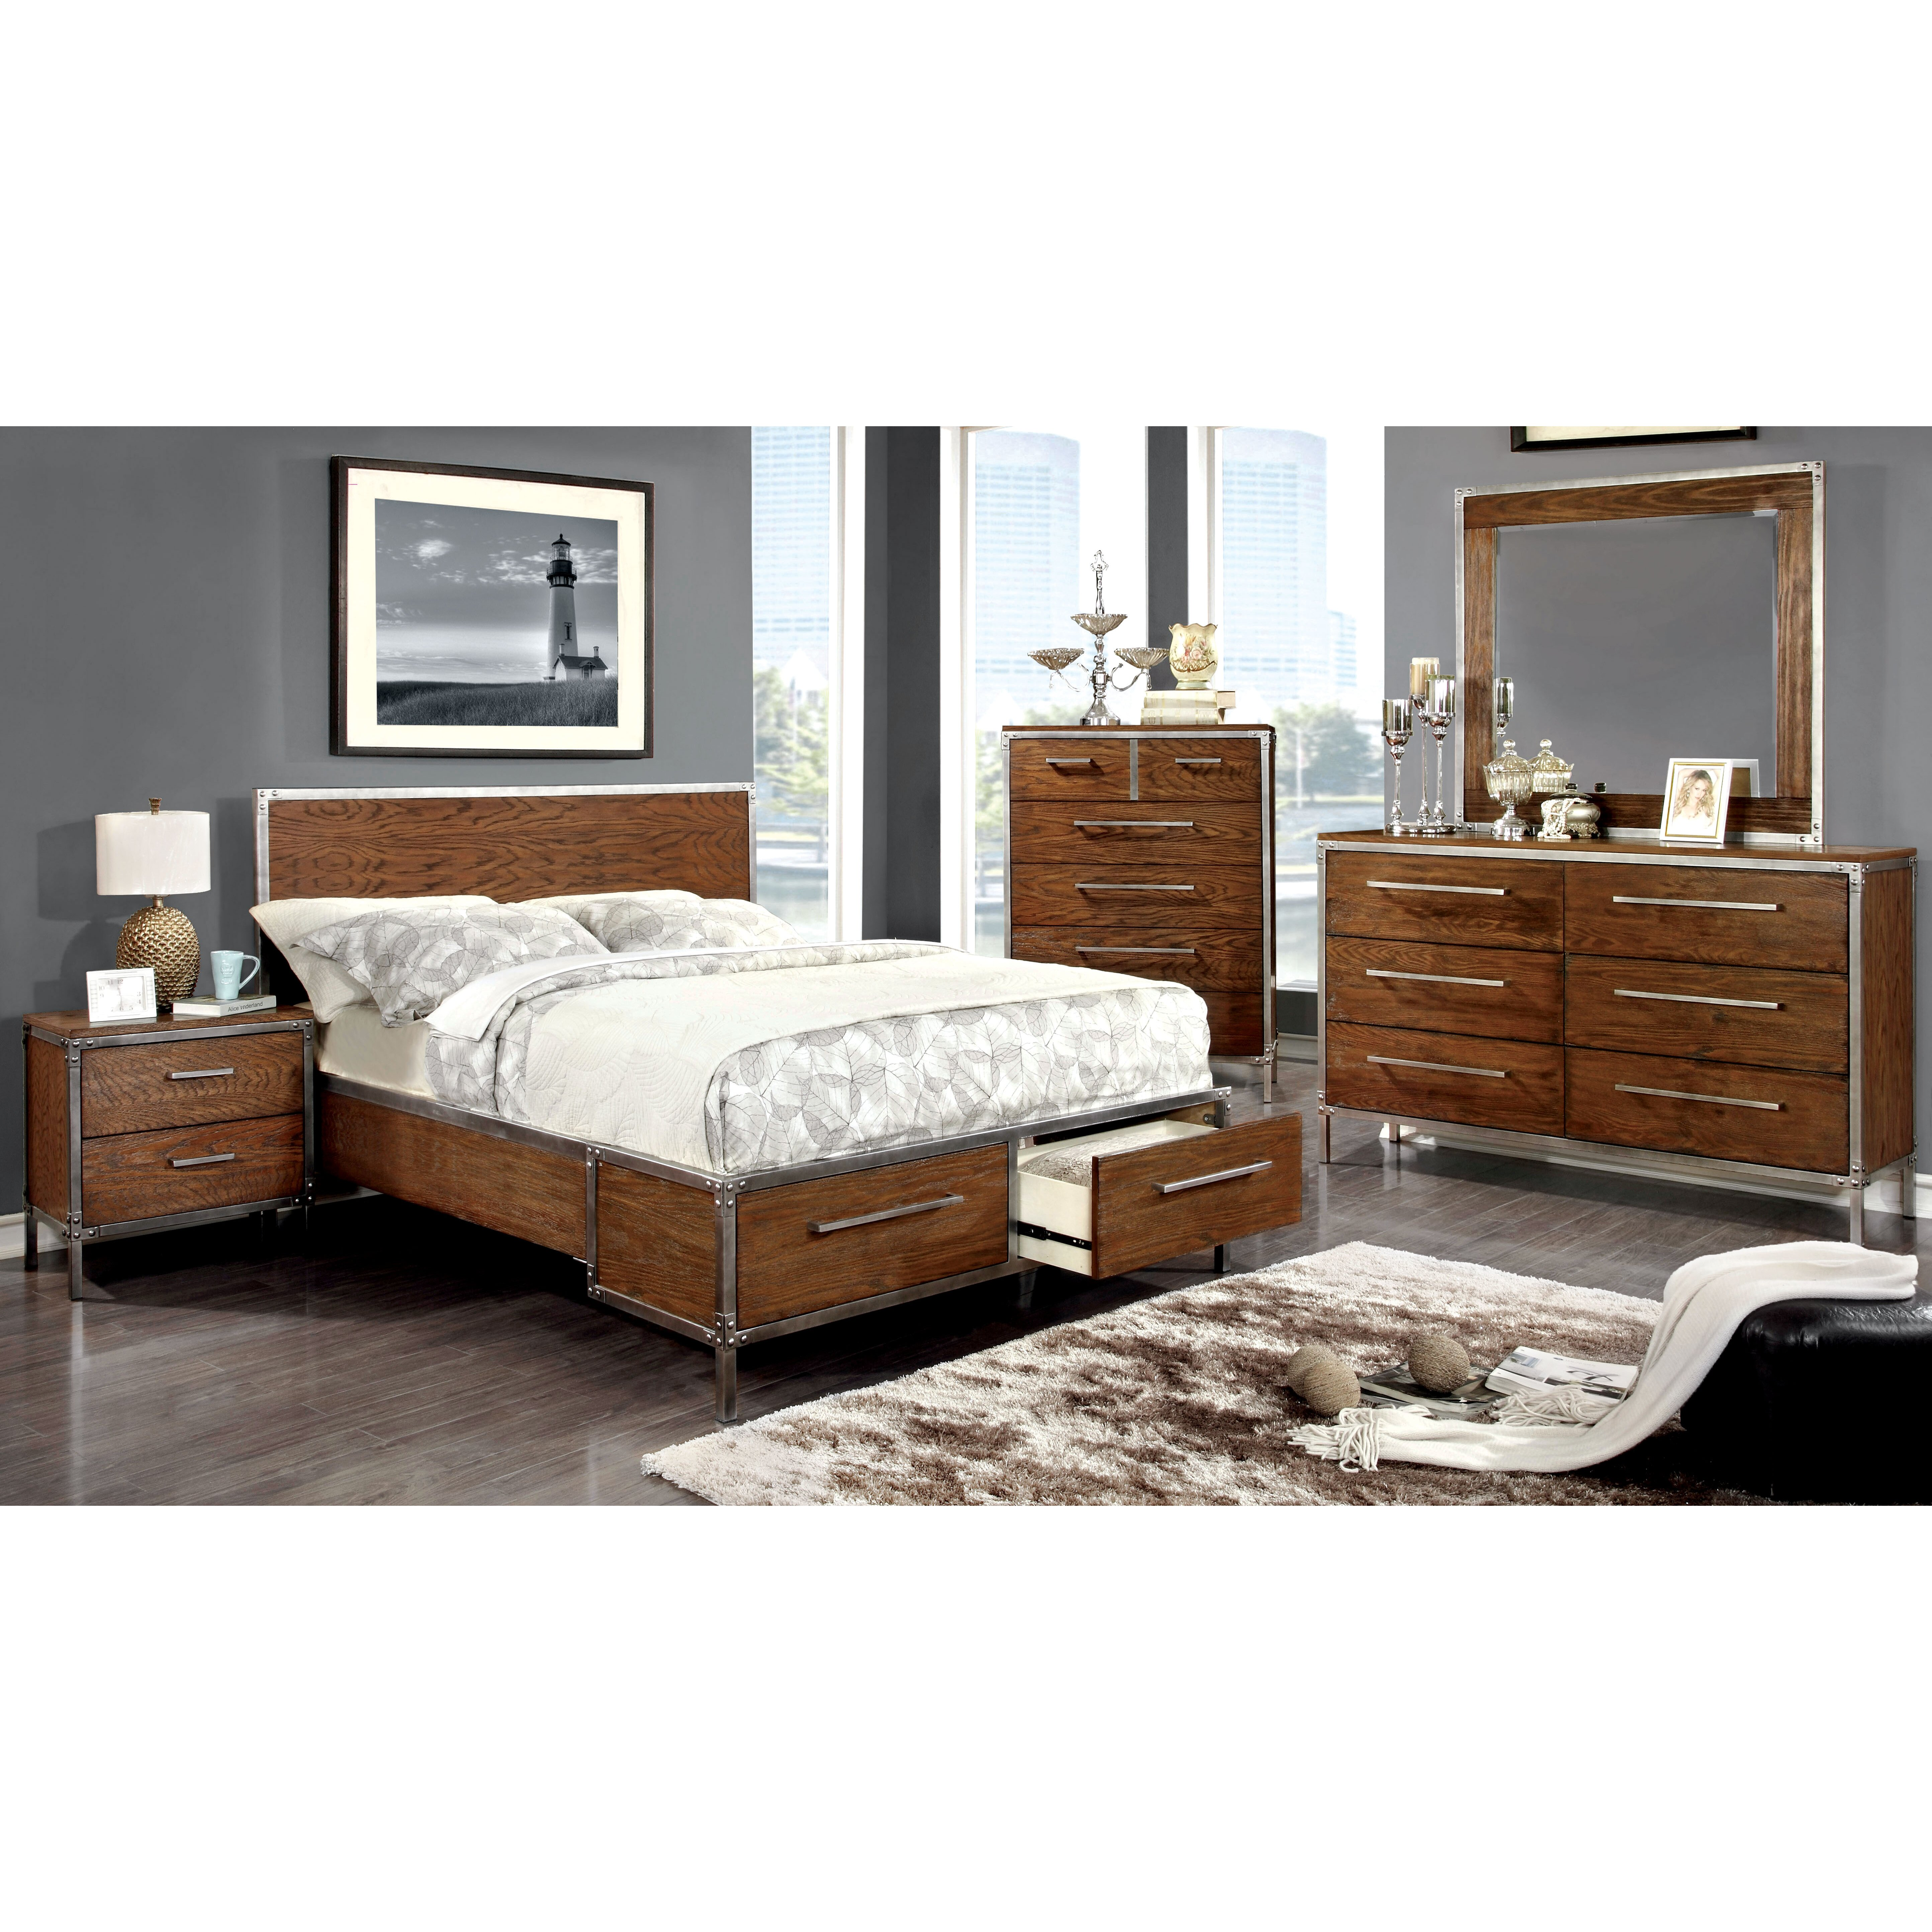 Trent austin design willard 2 drawer nightstand reviews - Industrial style bedroom furniture ...